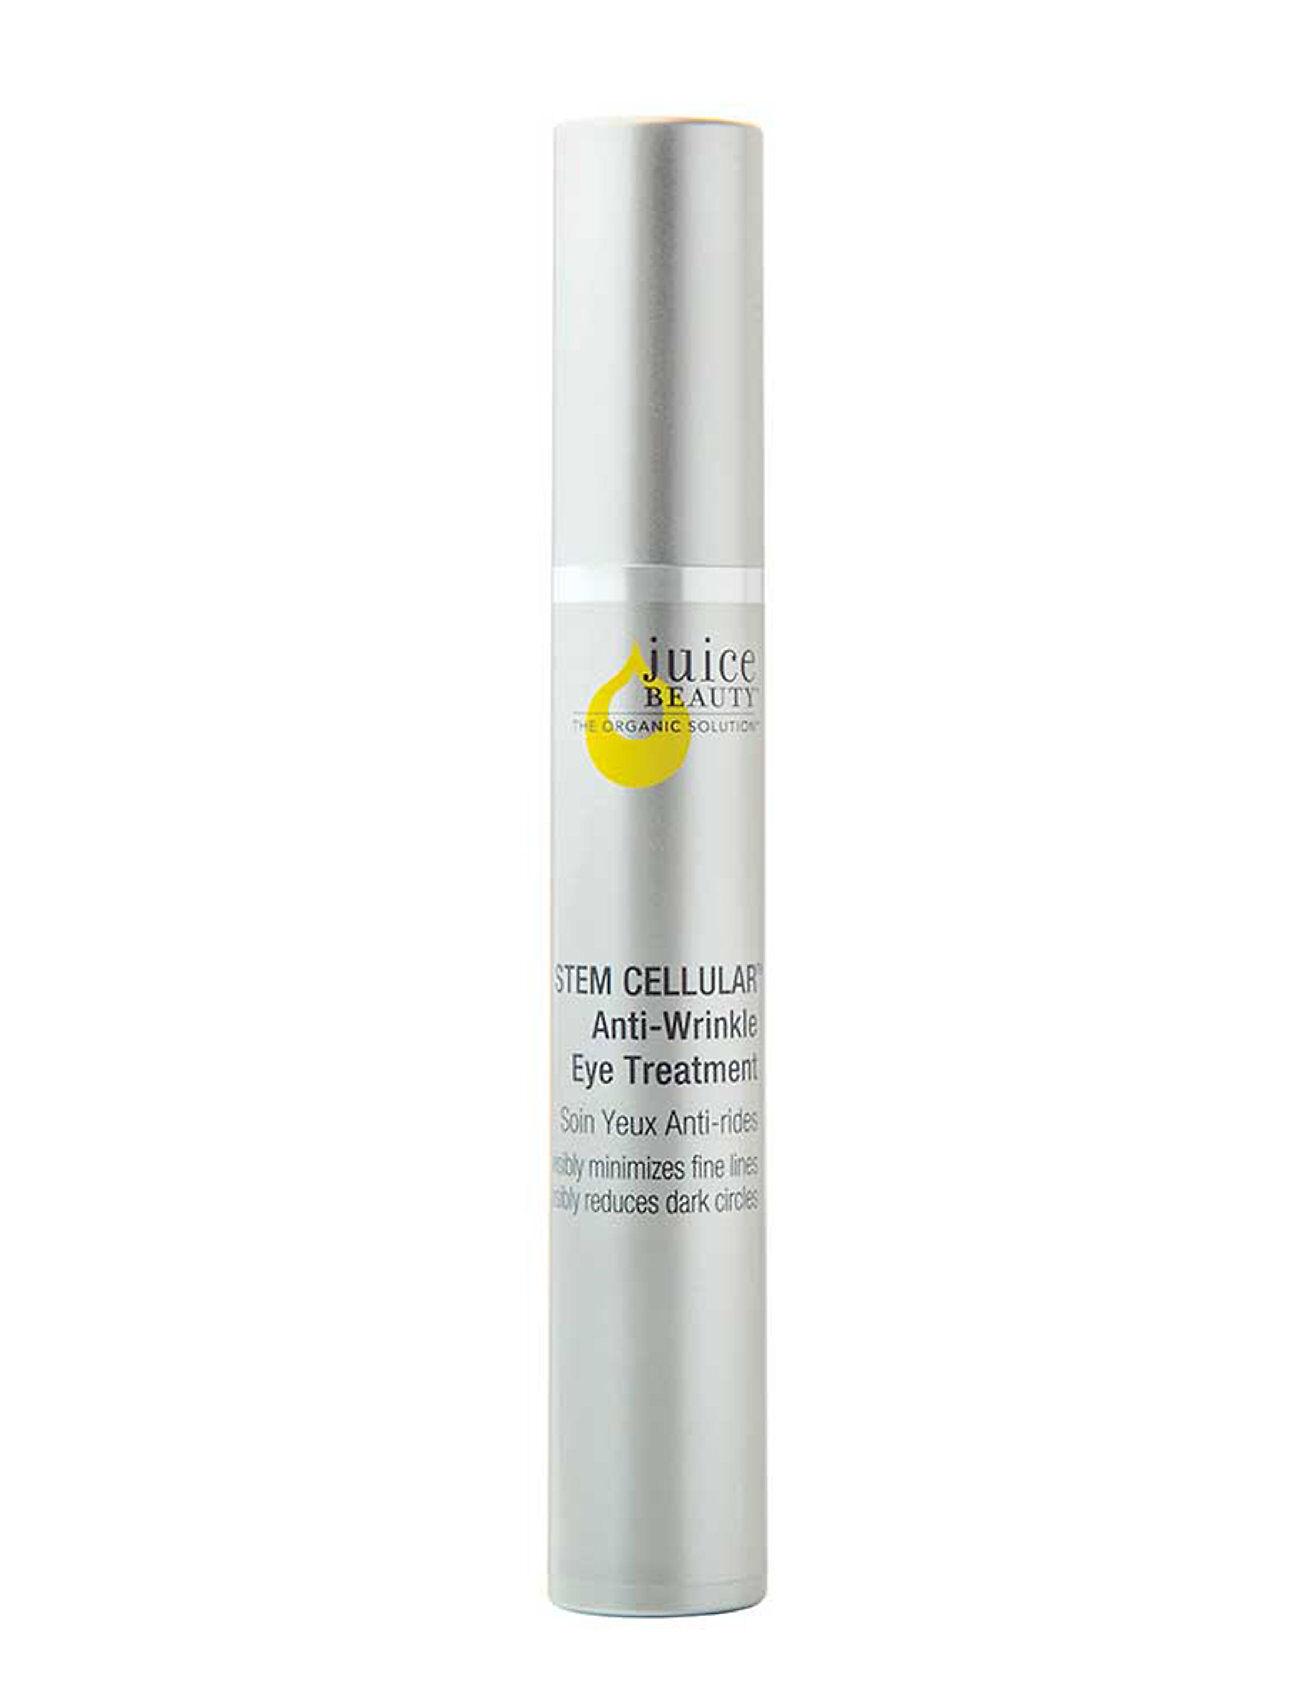 Juice Beauty Stem Cellular™ Anti-Wrinkle Eye Treatment